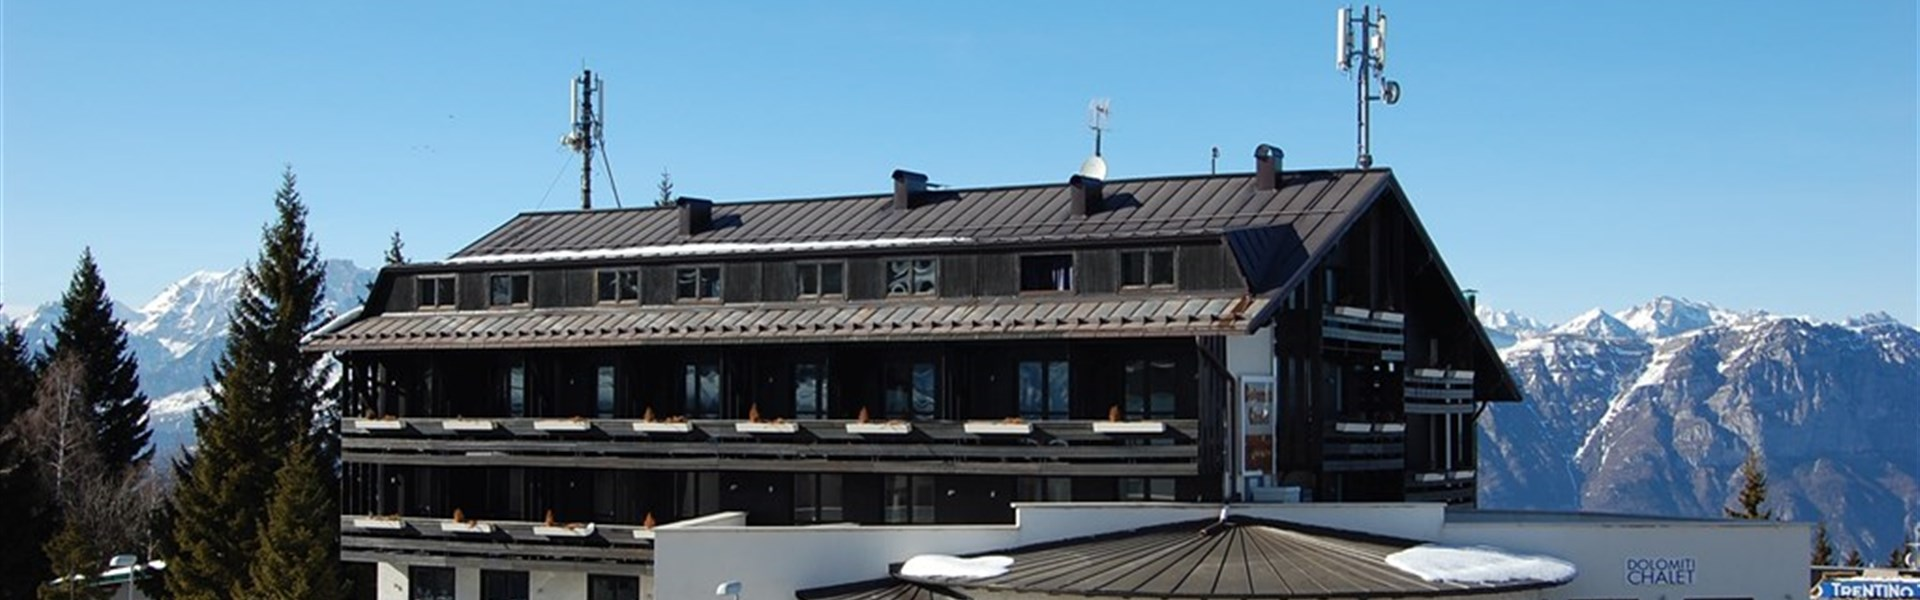 Marco Polo - Hotel Dolomiti Chalet -